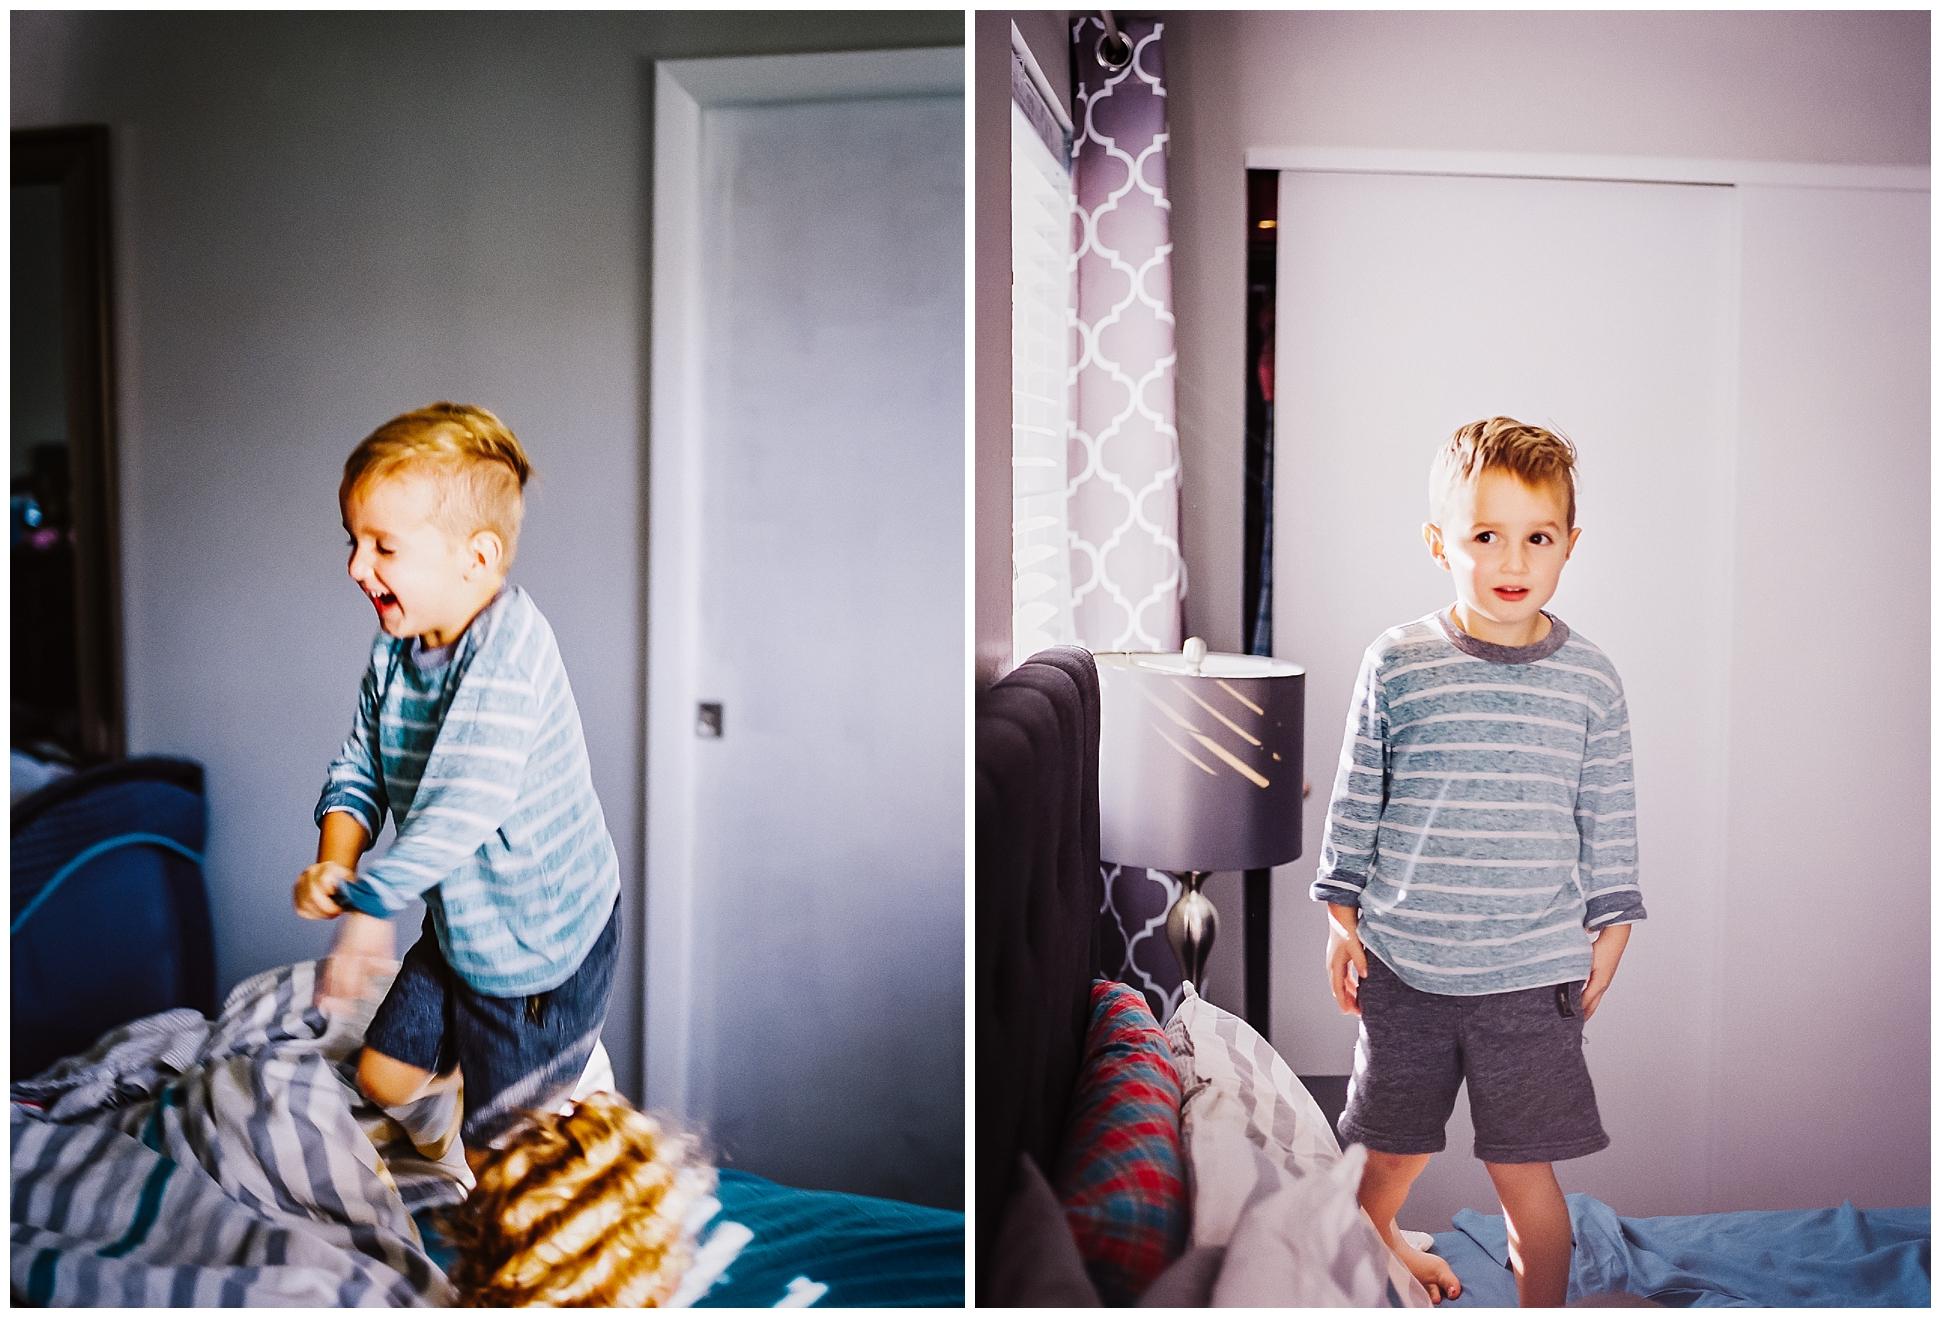 tampa-lifestyle-portrait-photographer-in-home-pentax-film-vs-digital_0014.jpg